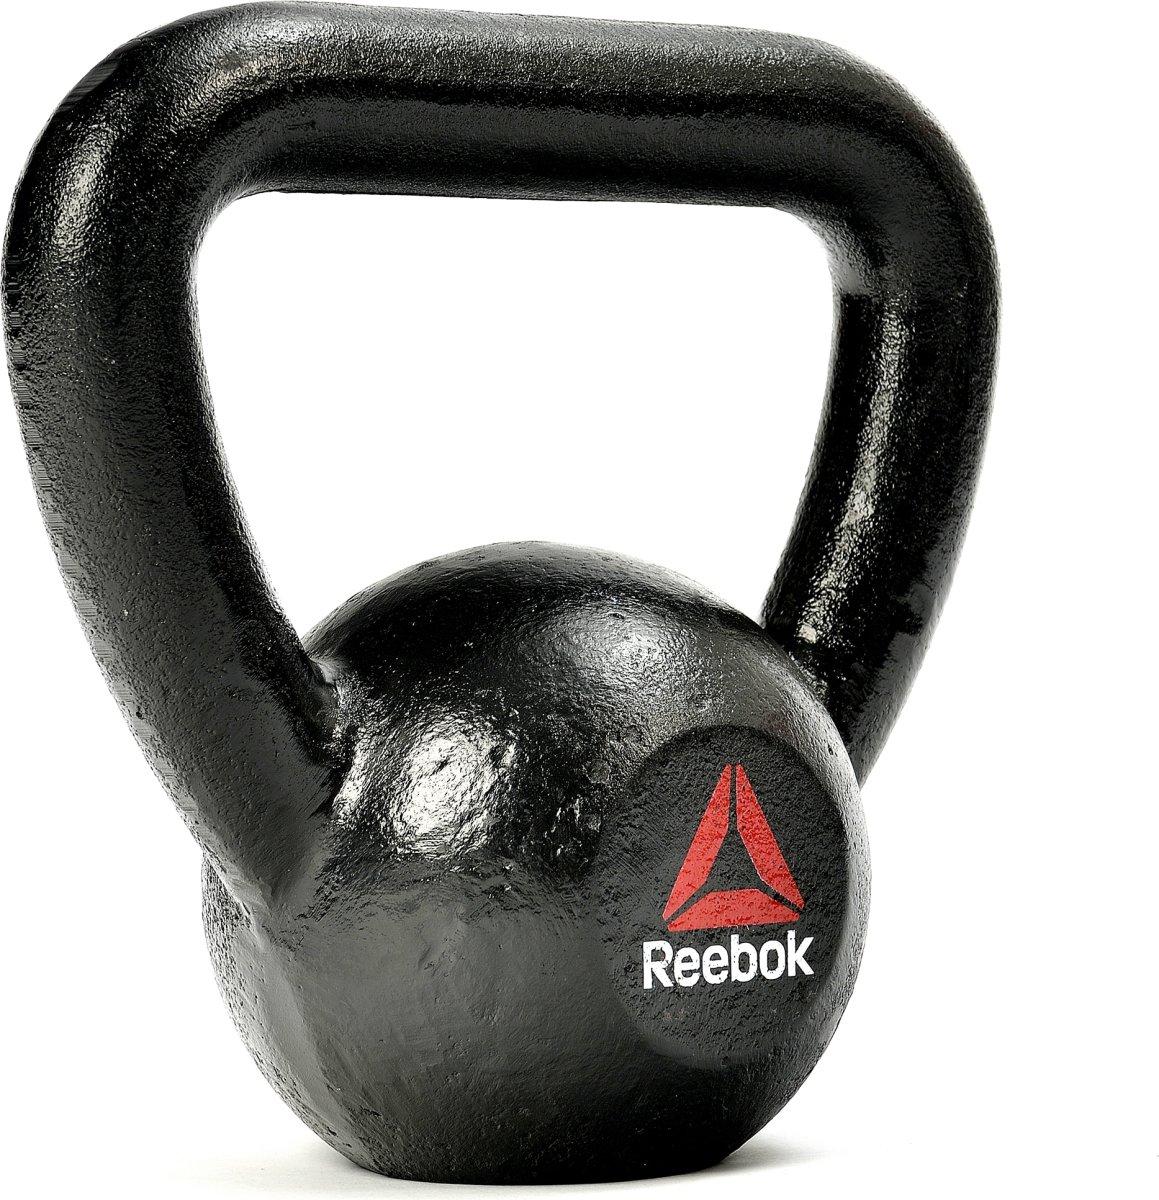 Reebok Functional Kettlebell 20 kg